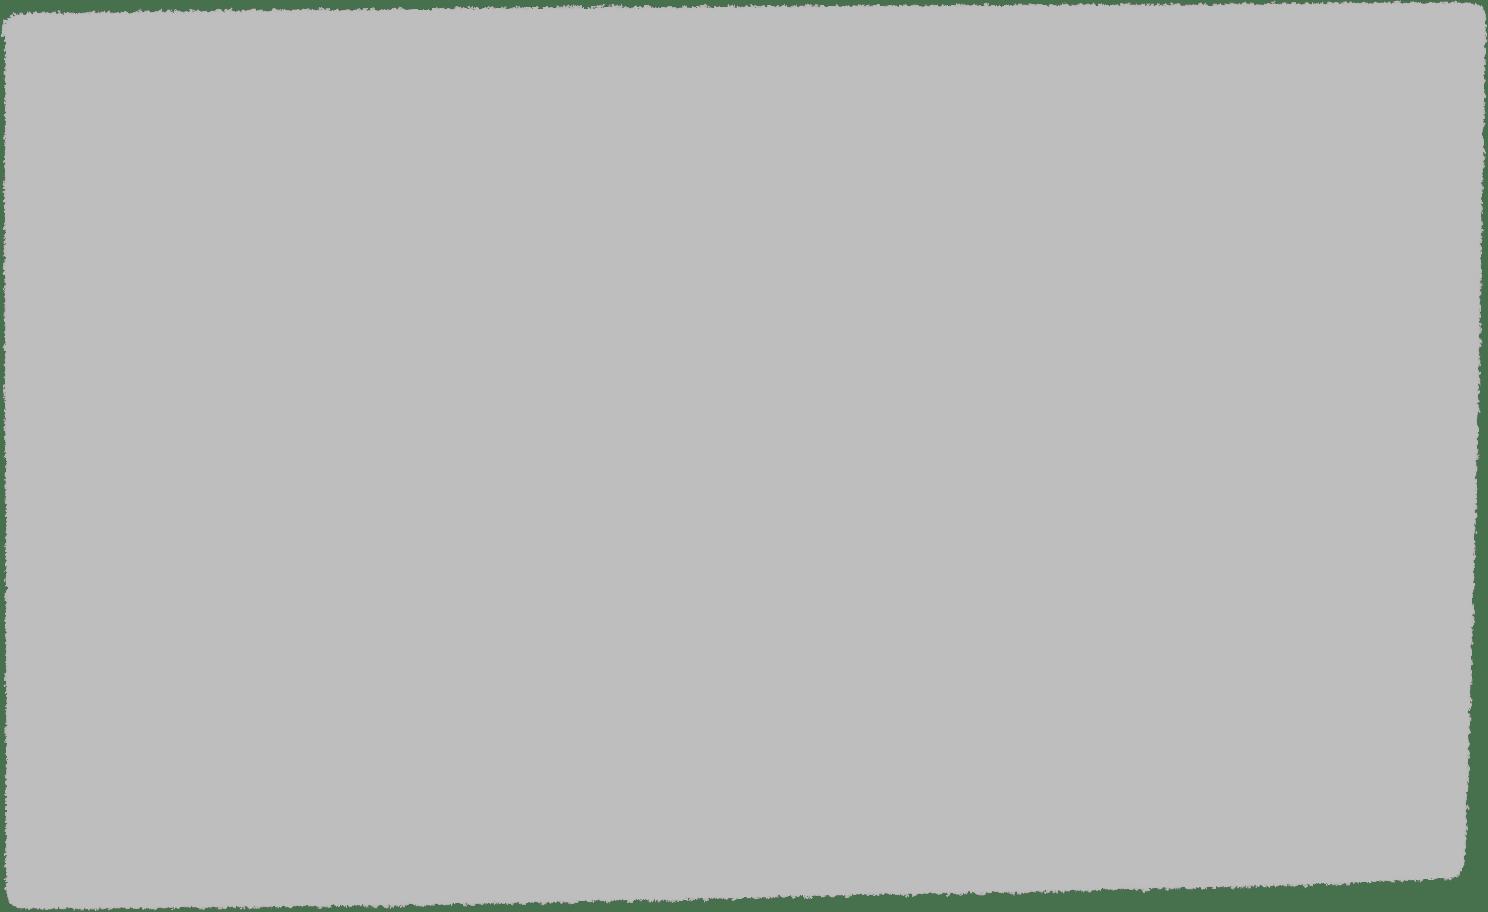 Slider media background